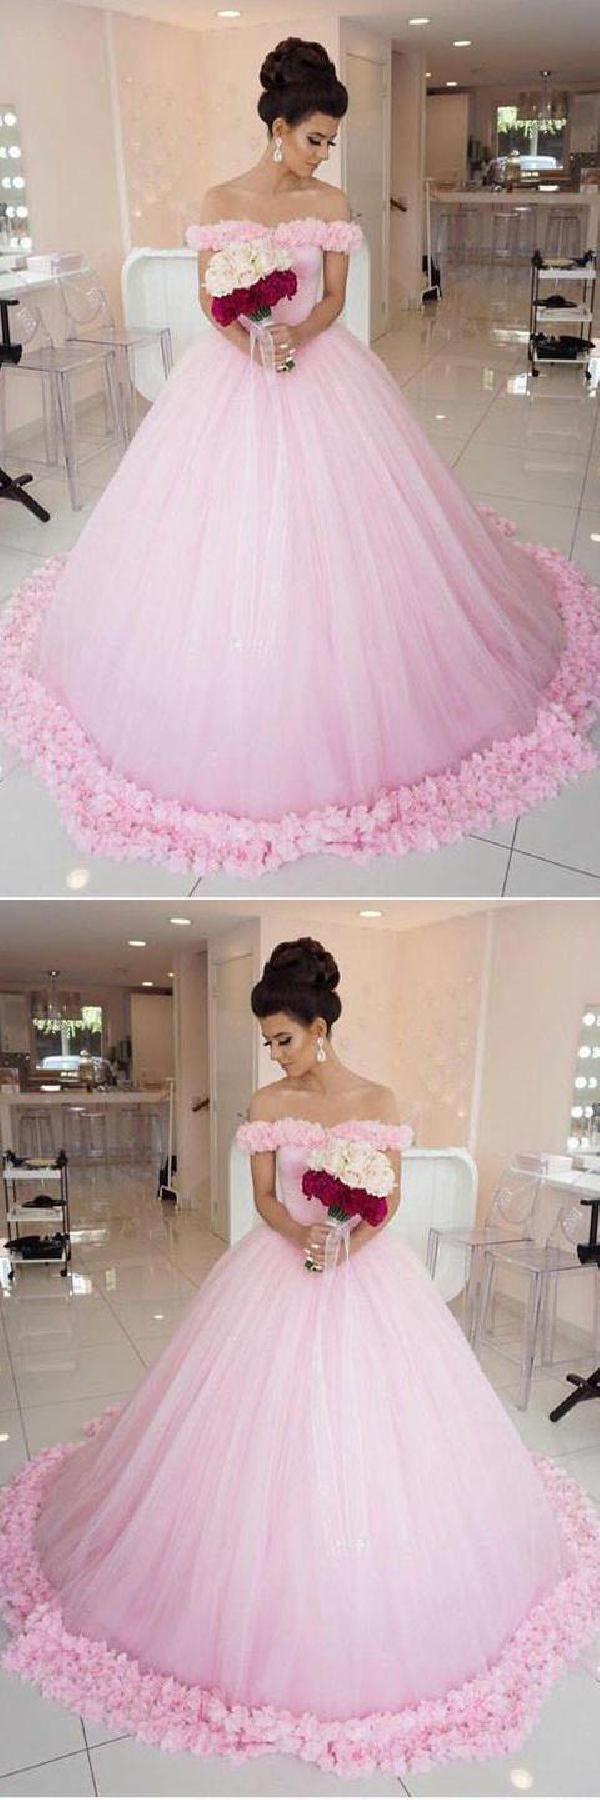 Prom dresses wedding dresses ball gown wedding dresses pink